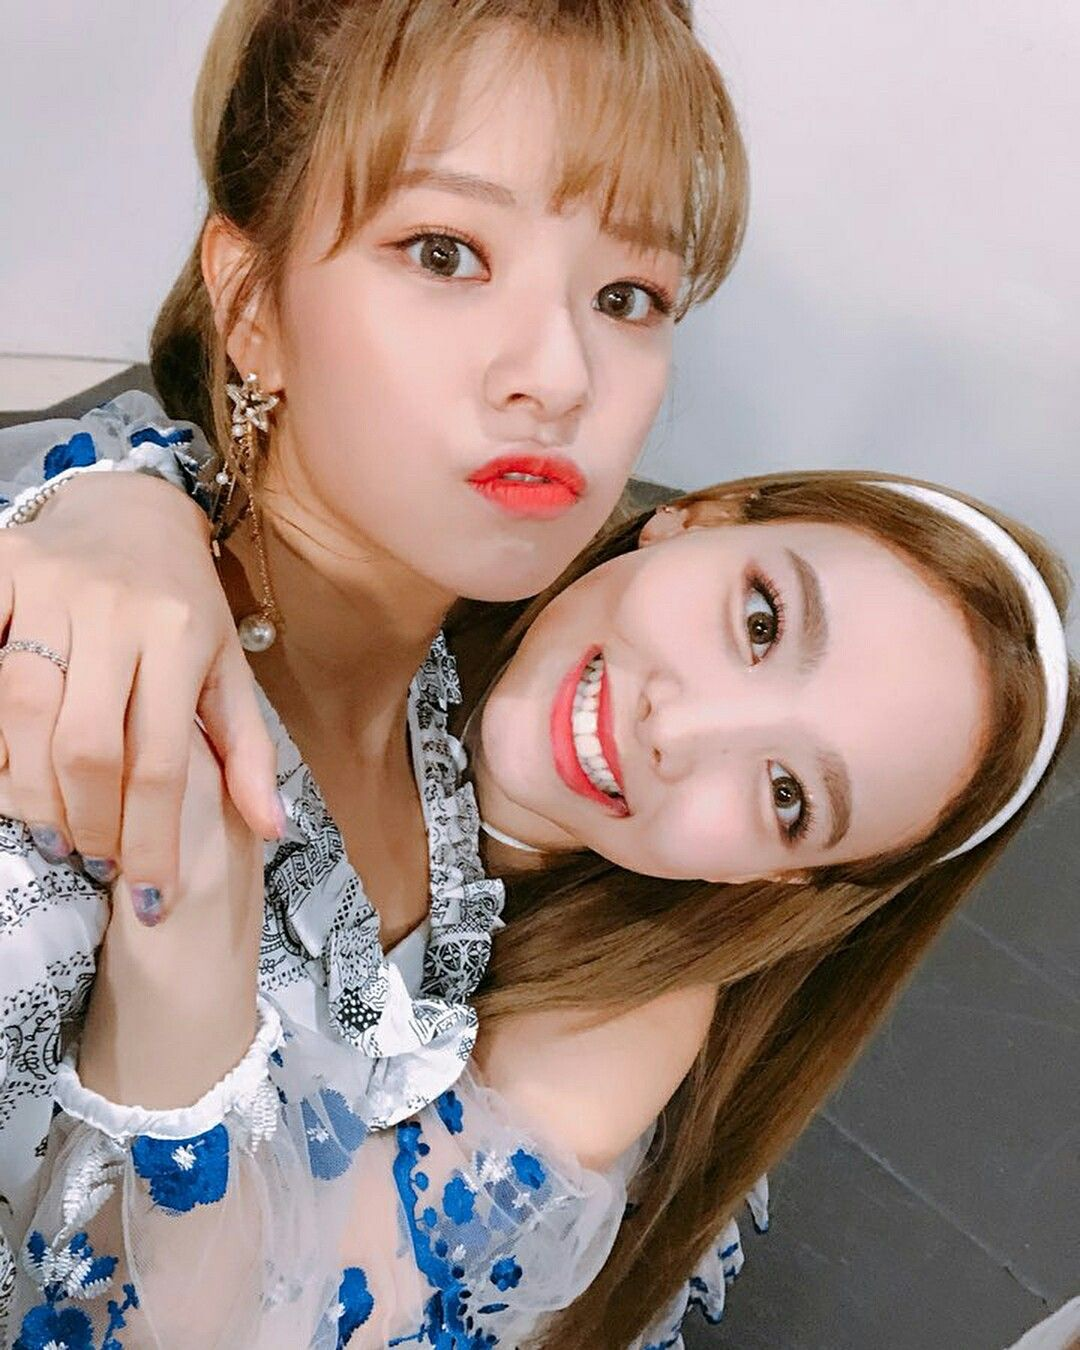 twice nayeon jeongyeon twicetagram